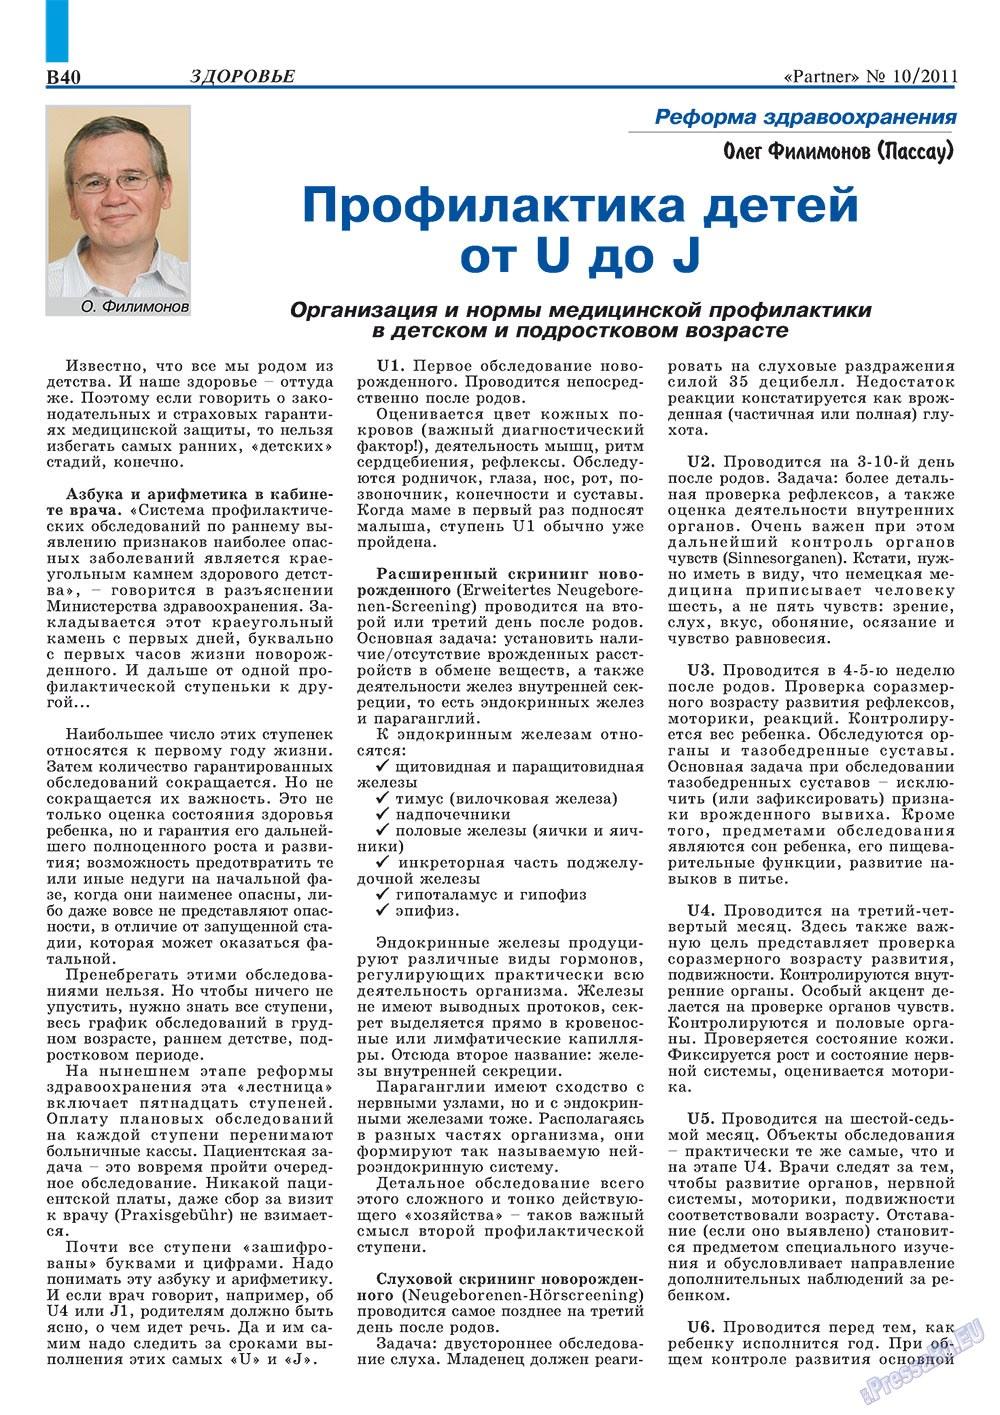 Партнер-север (журнал). 2011 год, номер 10, стр. 50